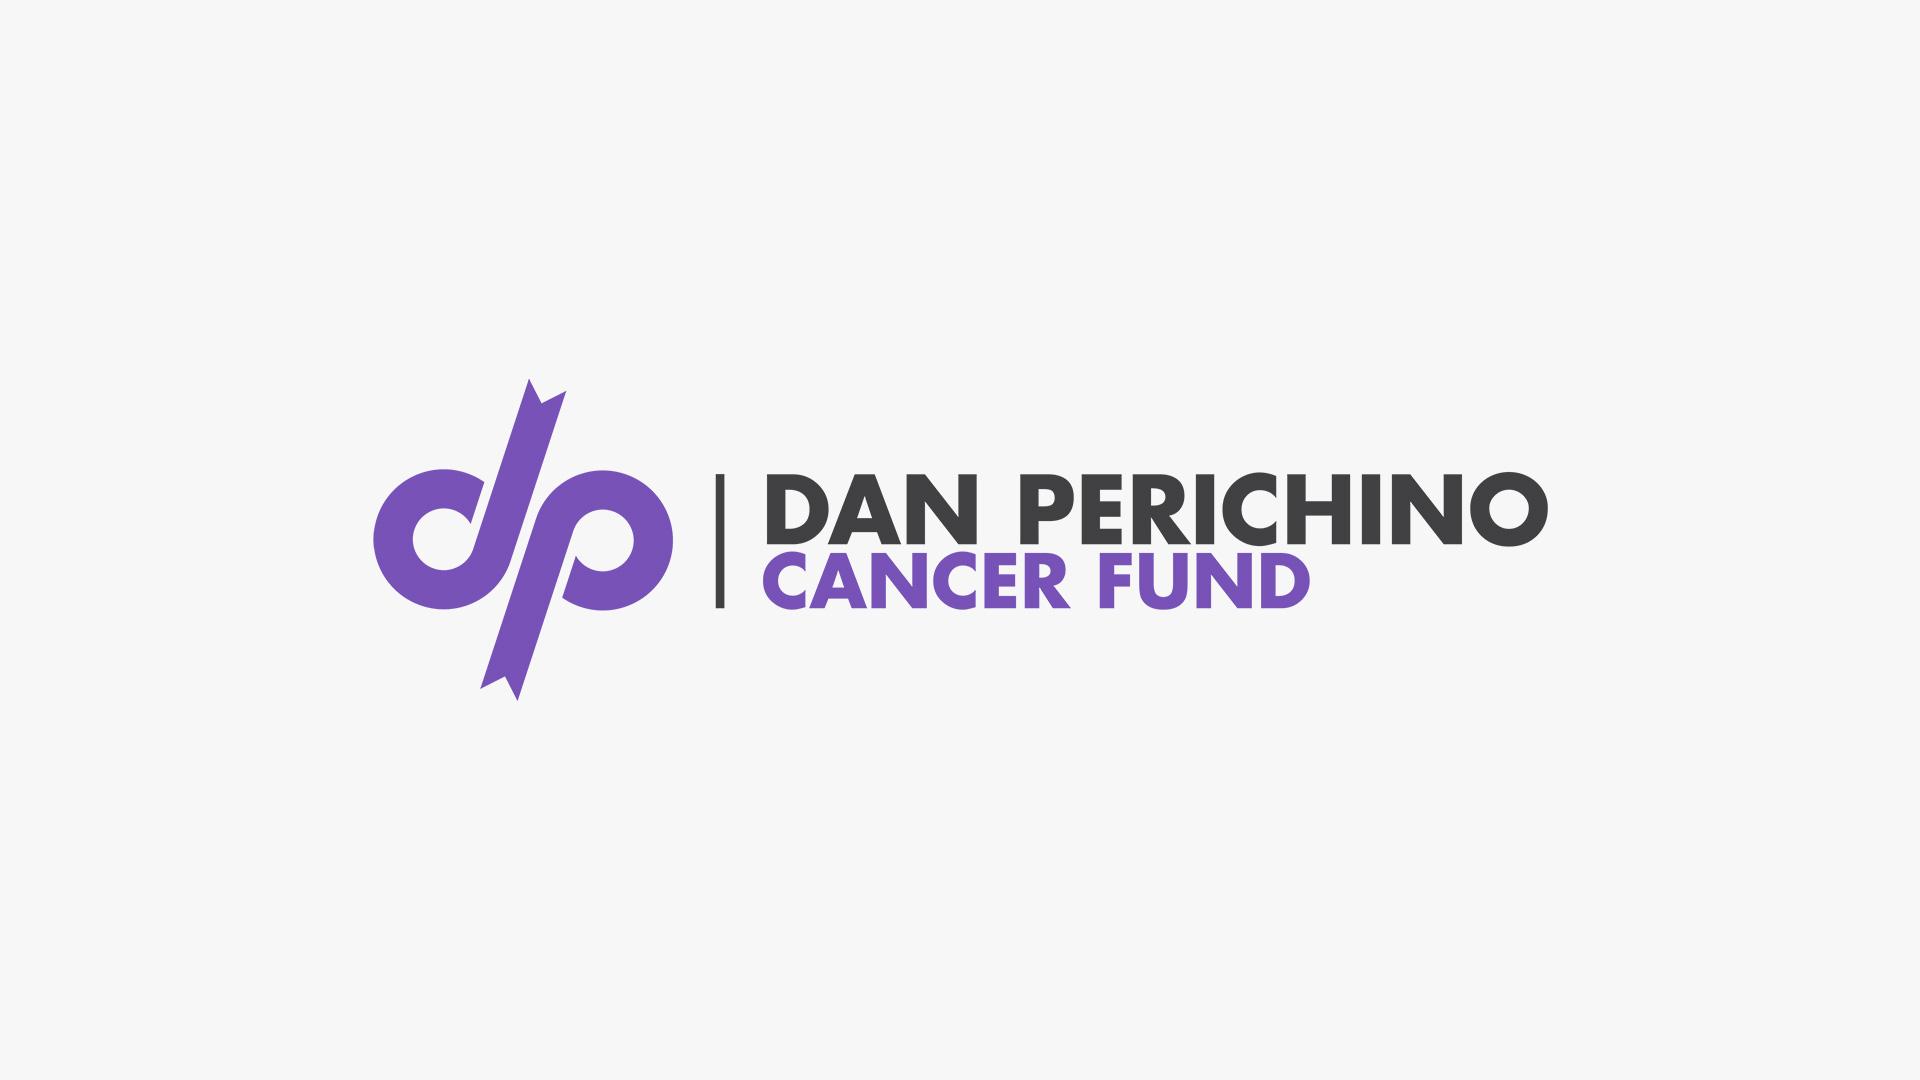 Dan Perichino Cancer Fund Logotype